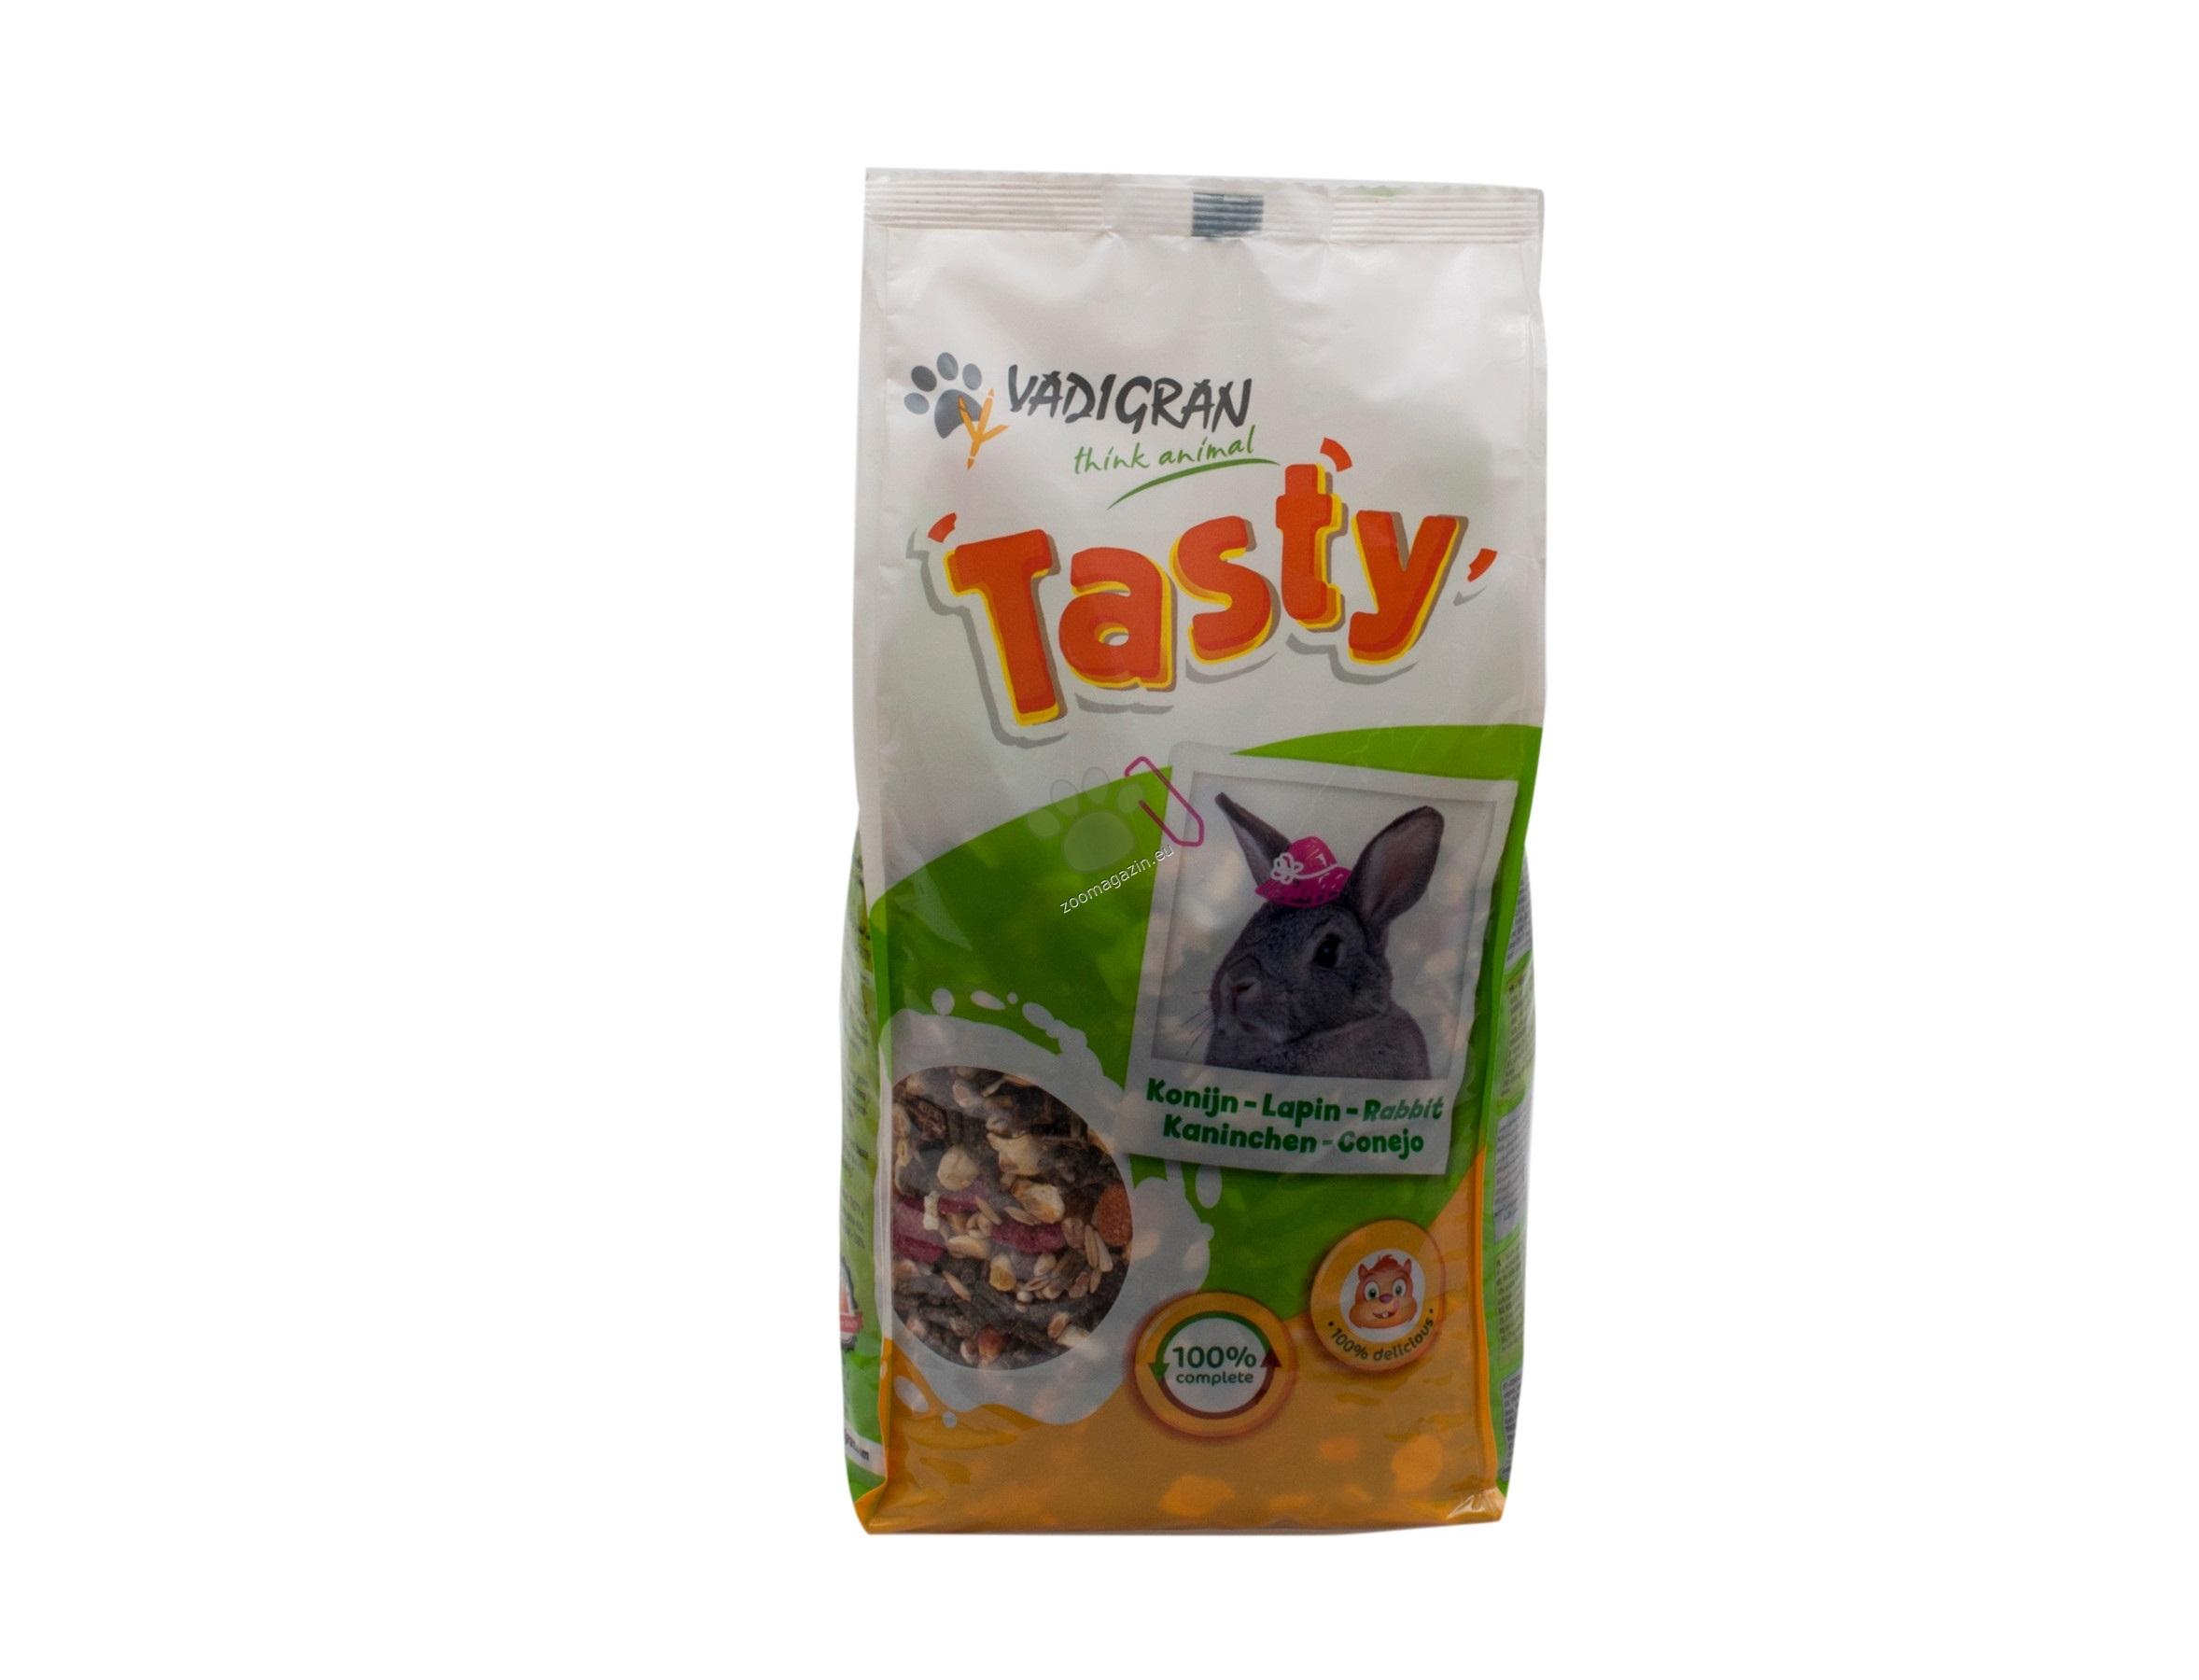 Vadigran - Tasty Rabbit - храна за мини зайчета 2.25 кг.